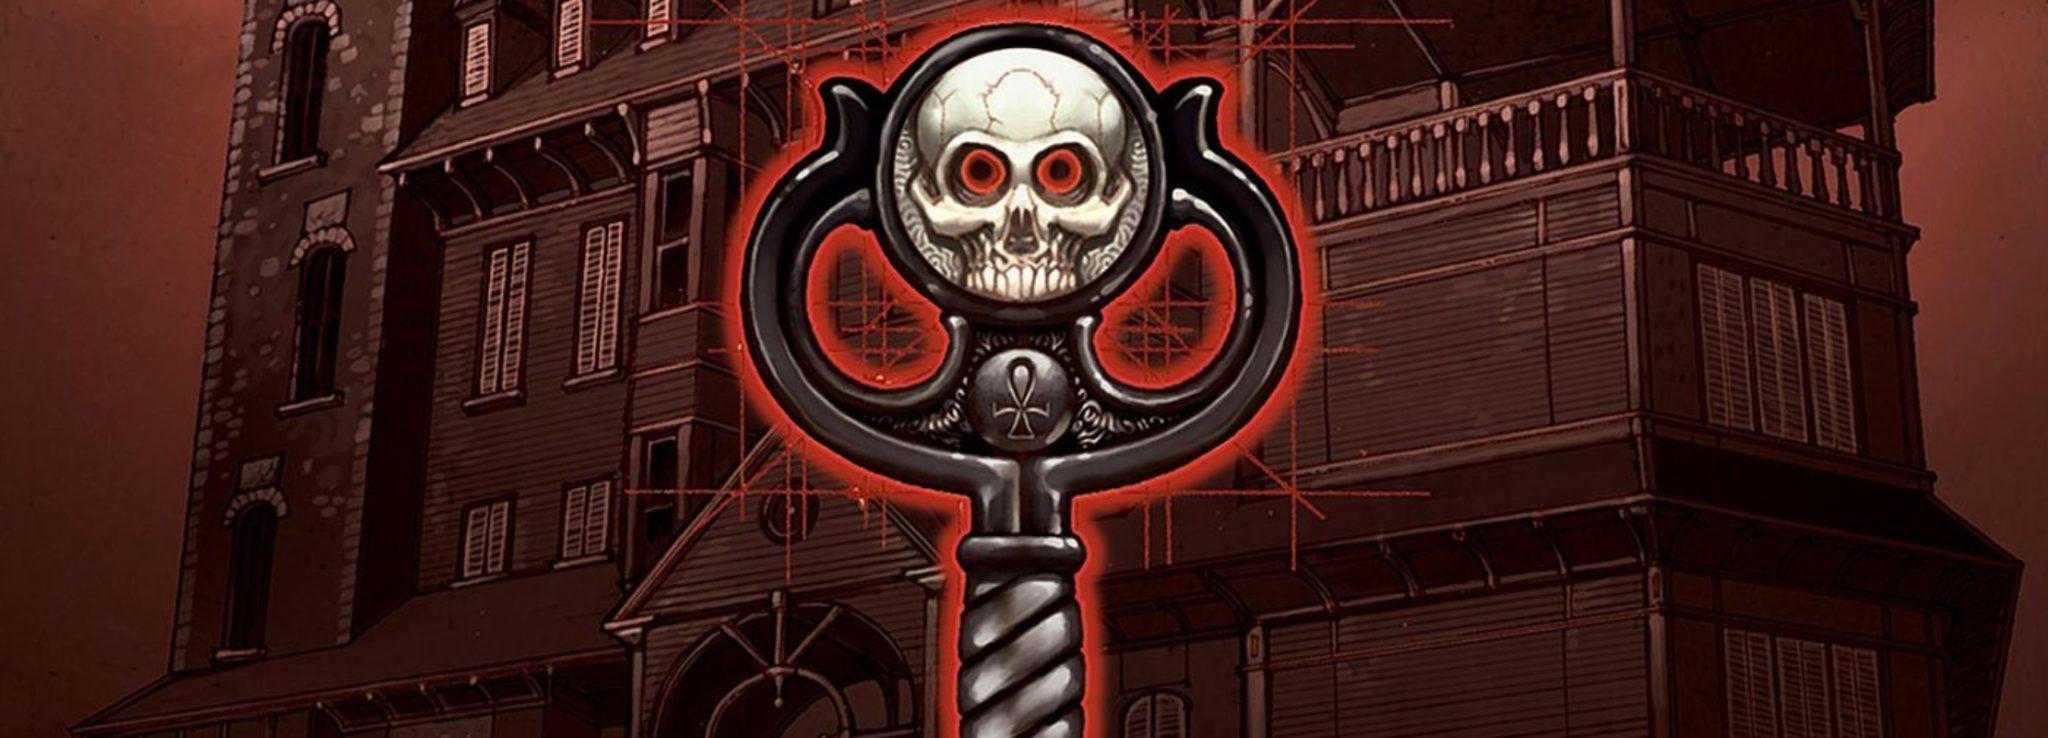 Locke & Key avrà un crossover a fumetti con Sandman thumbnail